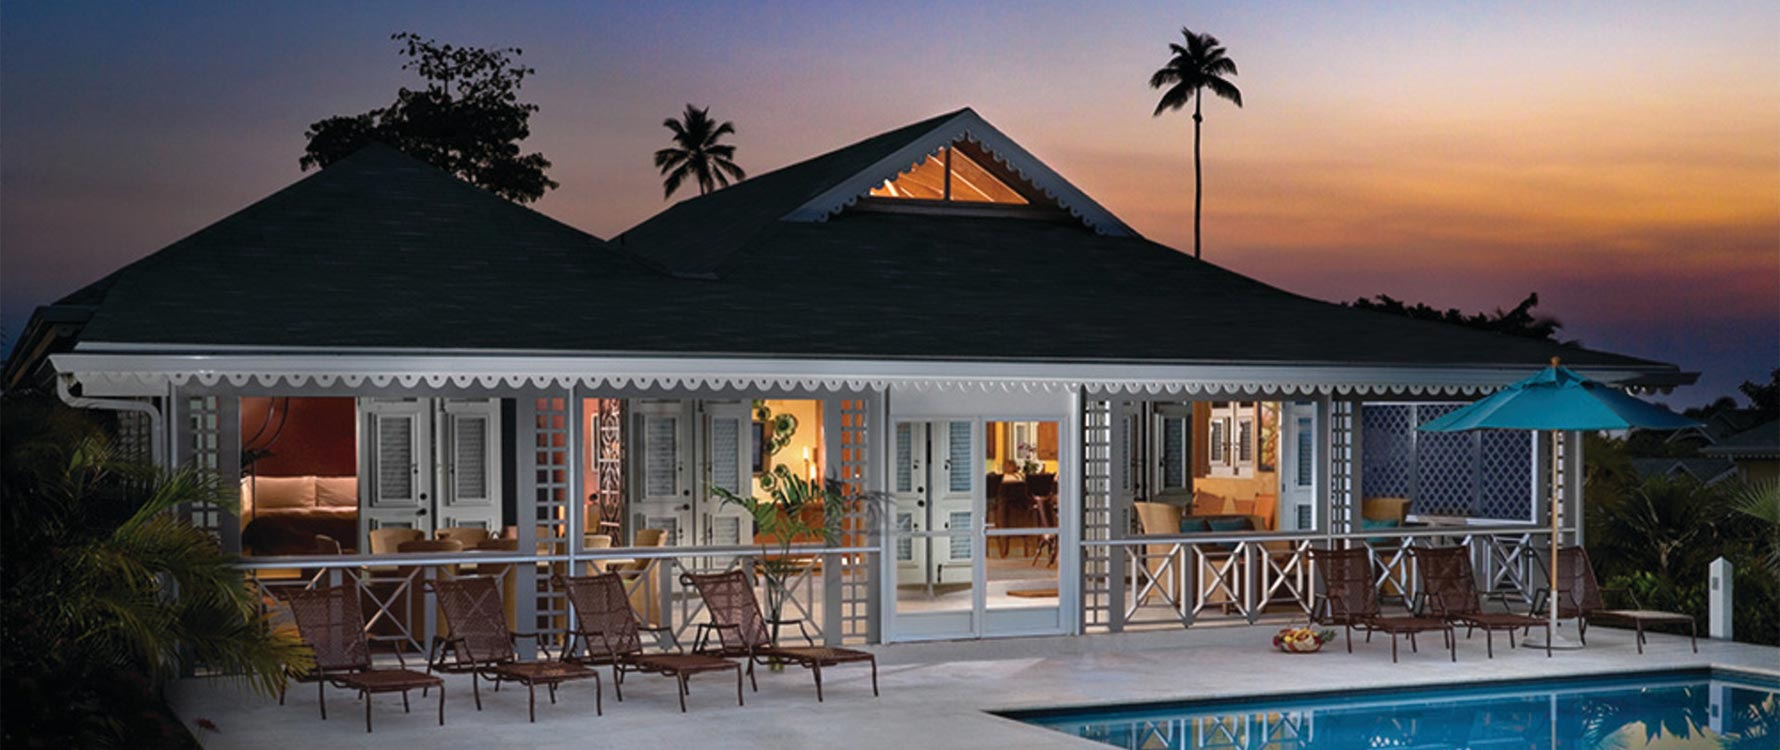 Pool Deck/Spa Exterior at Sunset